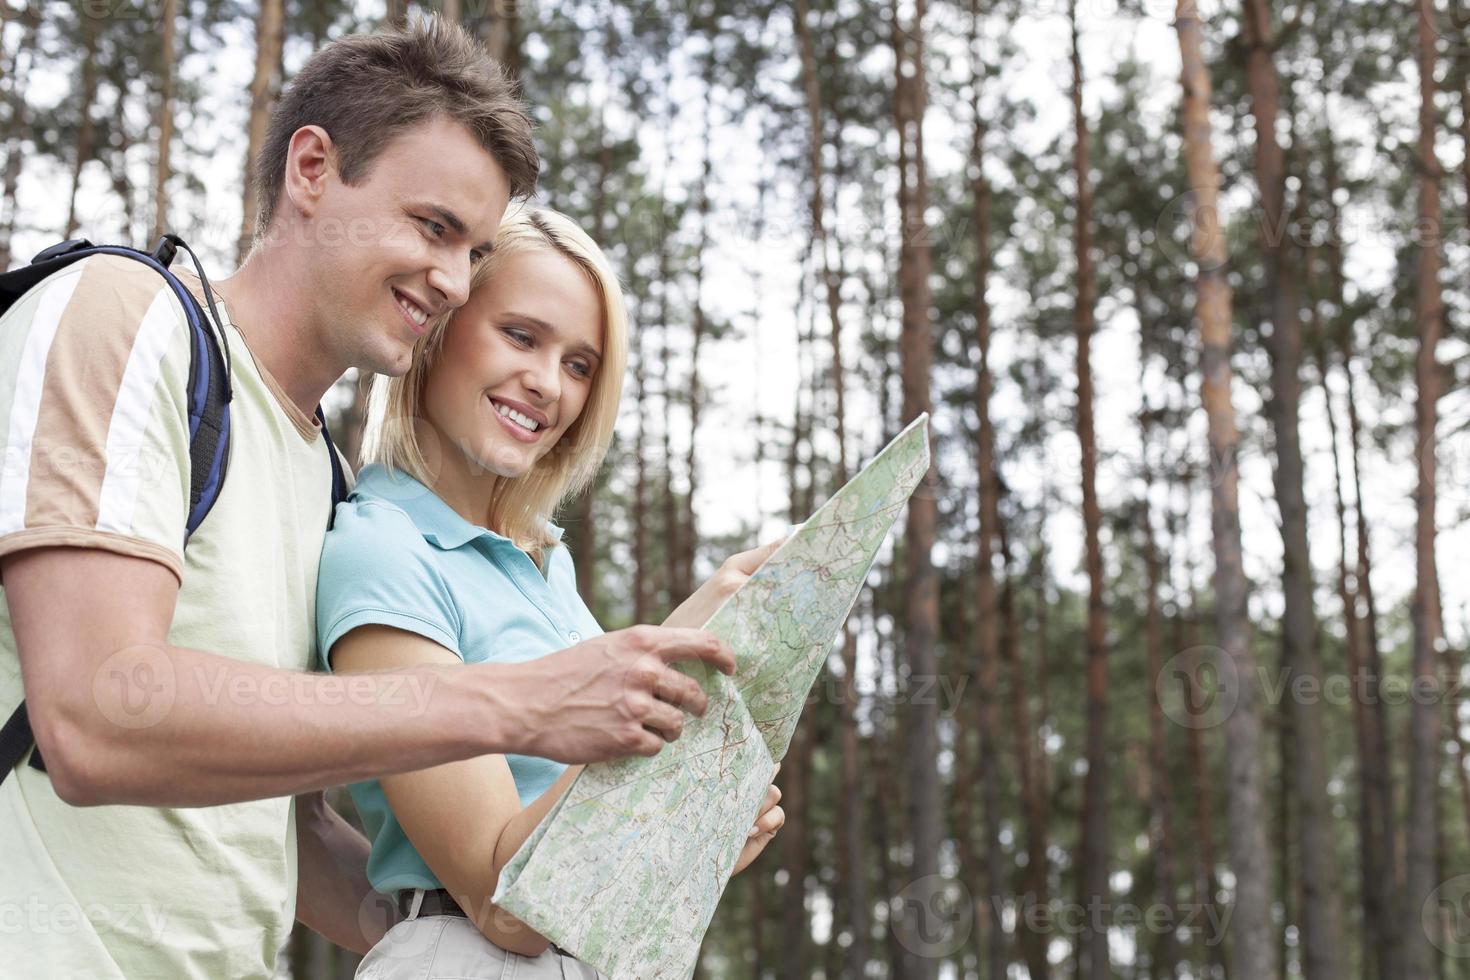 glada unga backpackers som tittar på kartan i skogen foto